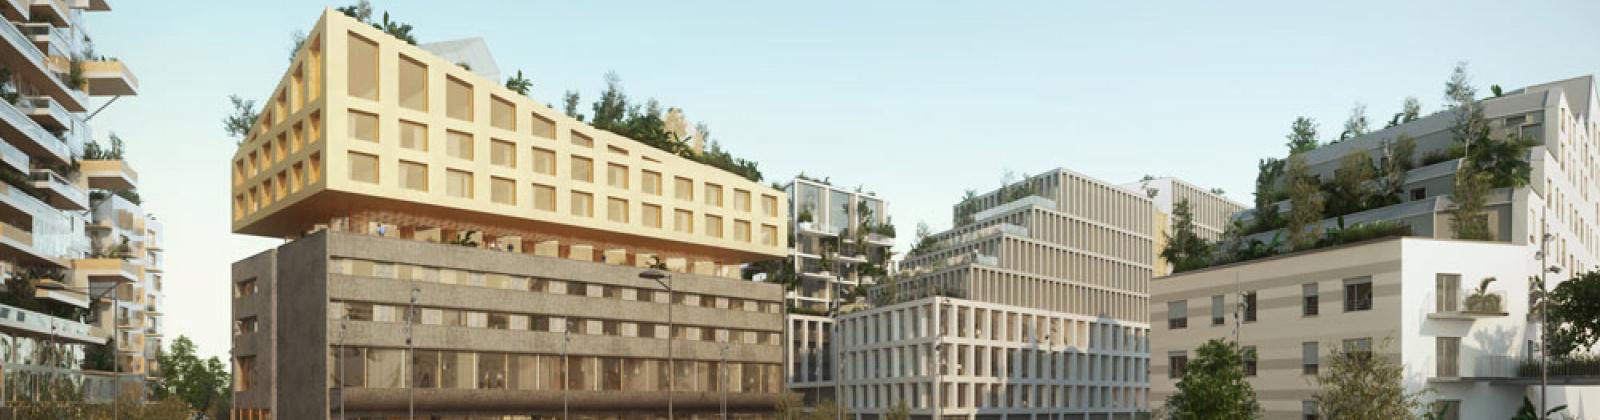 Carle Vernet,Bordeaux,France 33800,Appartement,Carle Vernet,1195